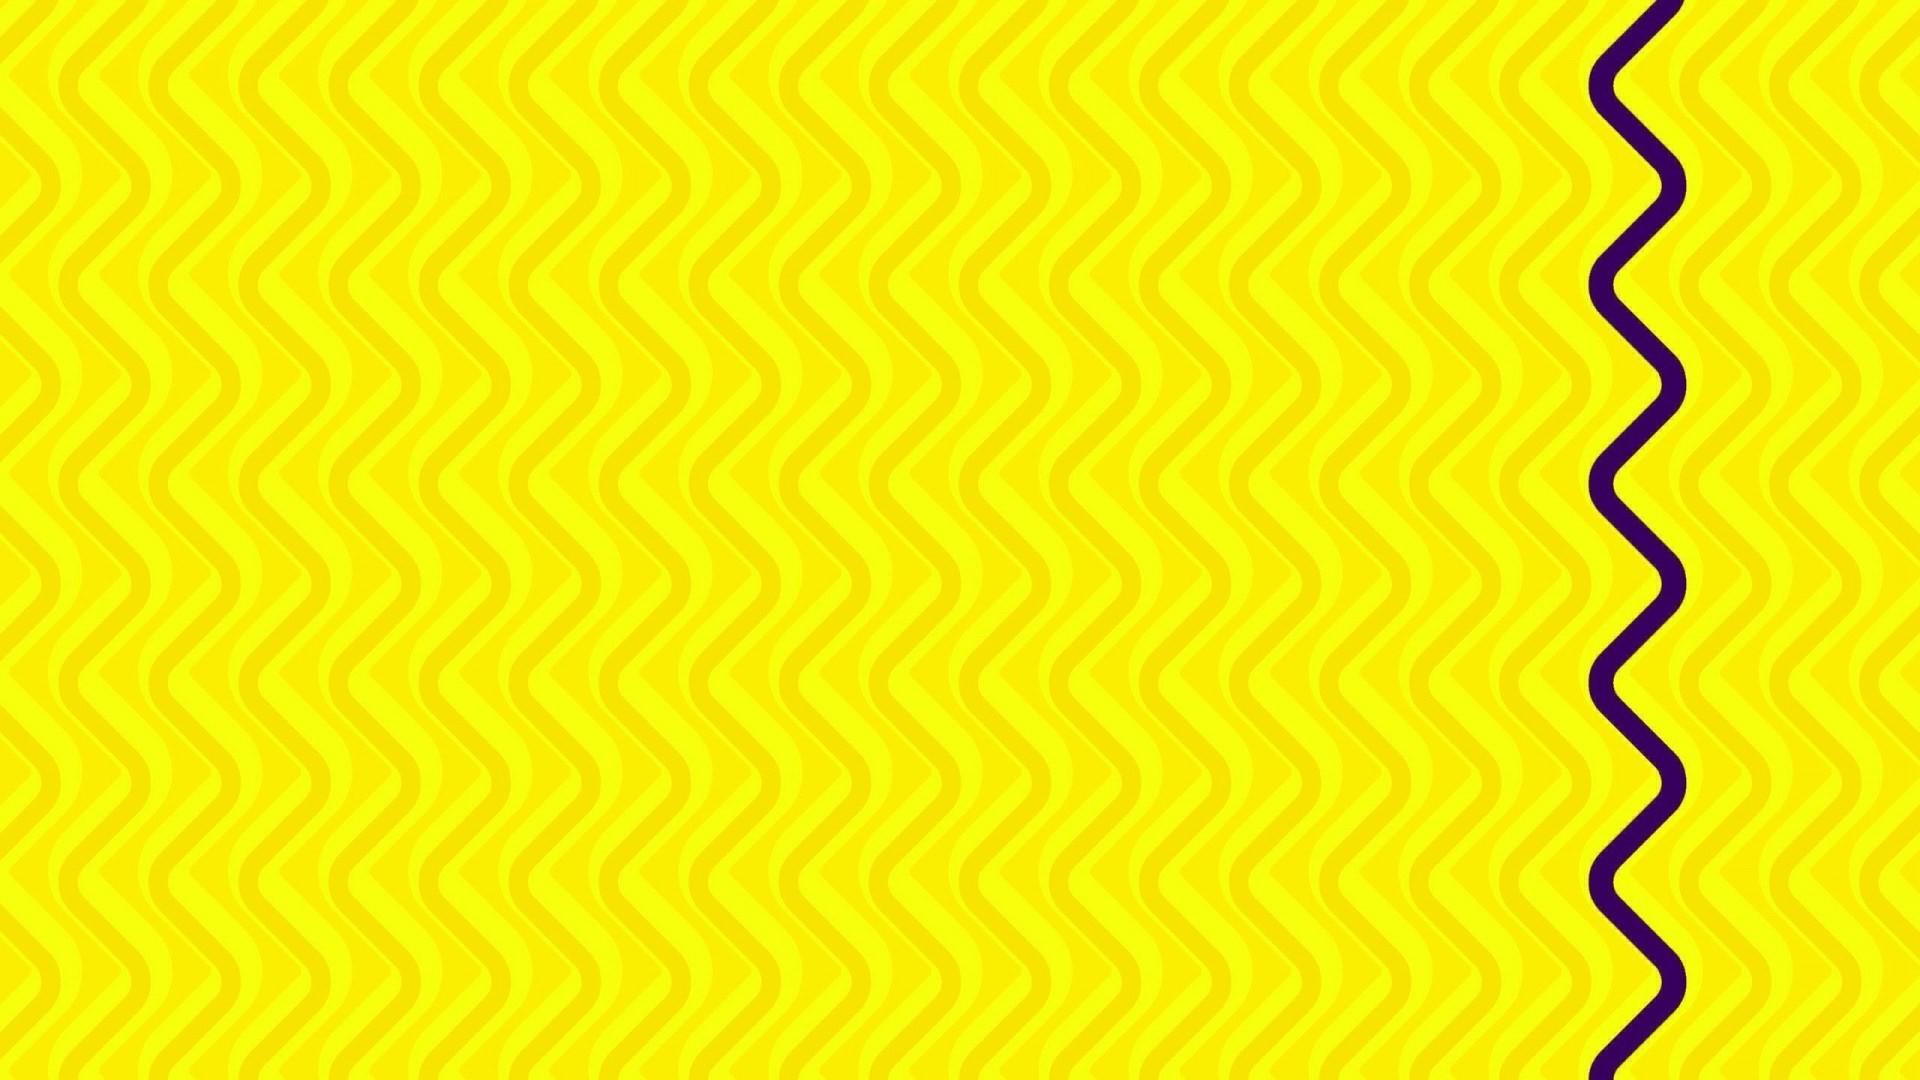 Yellow Desktop Backgrounds 72 Images